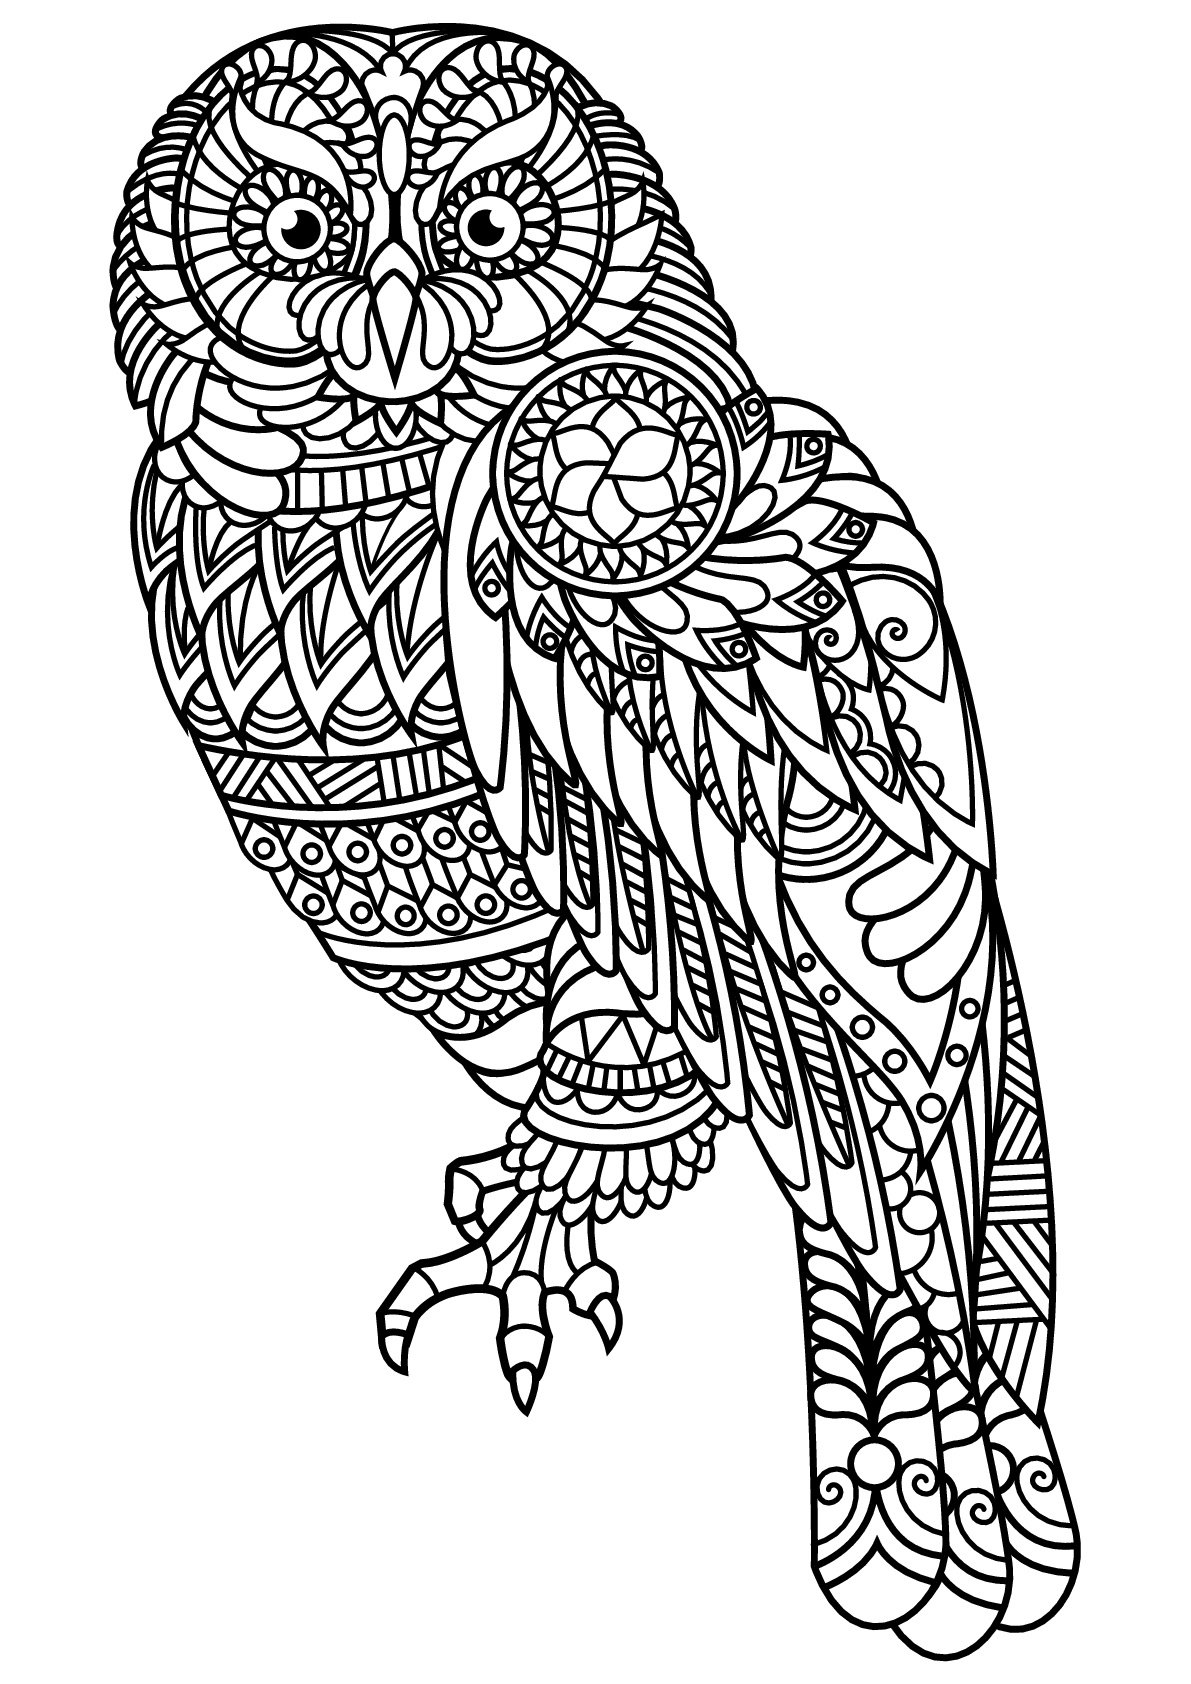 1191x1684 Owls